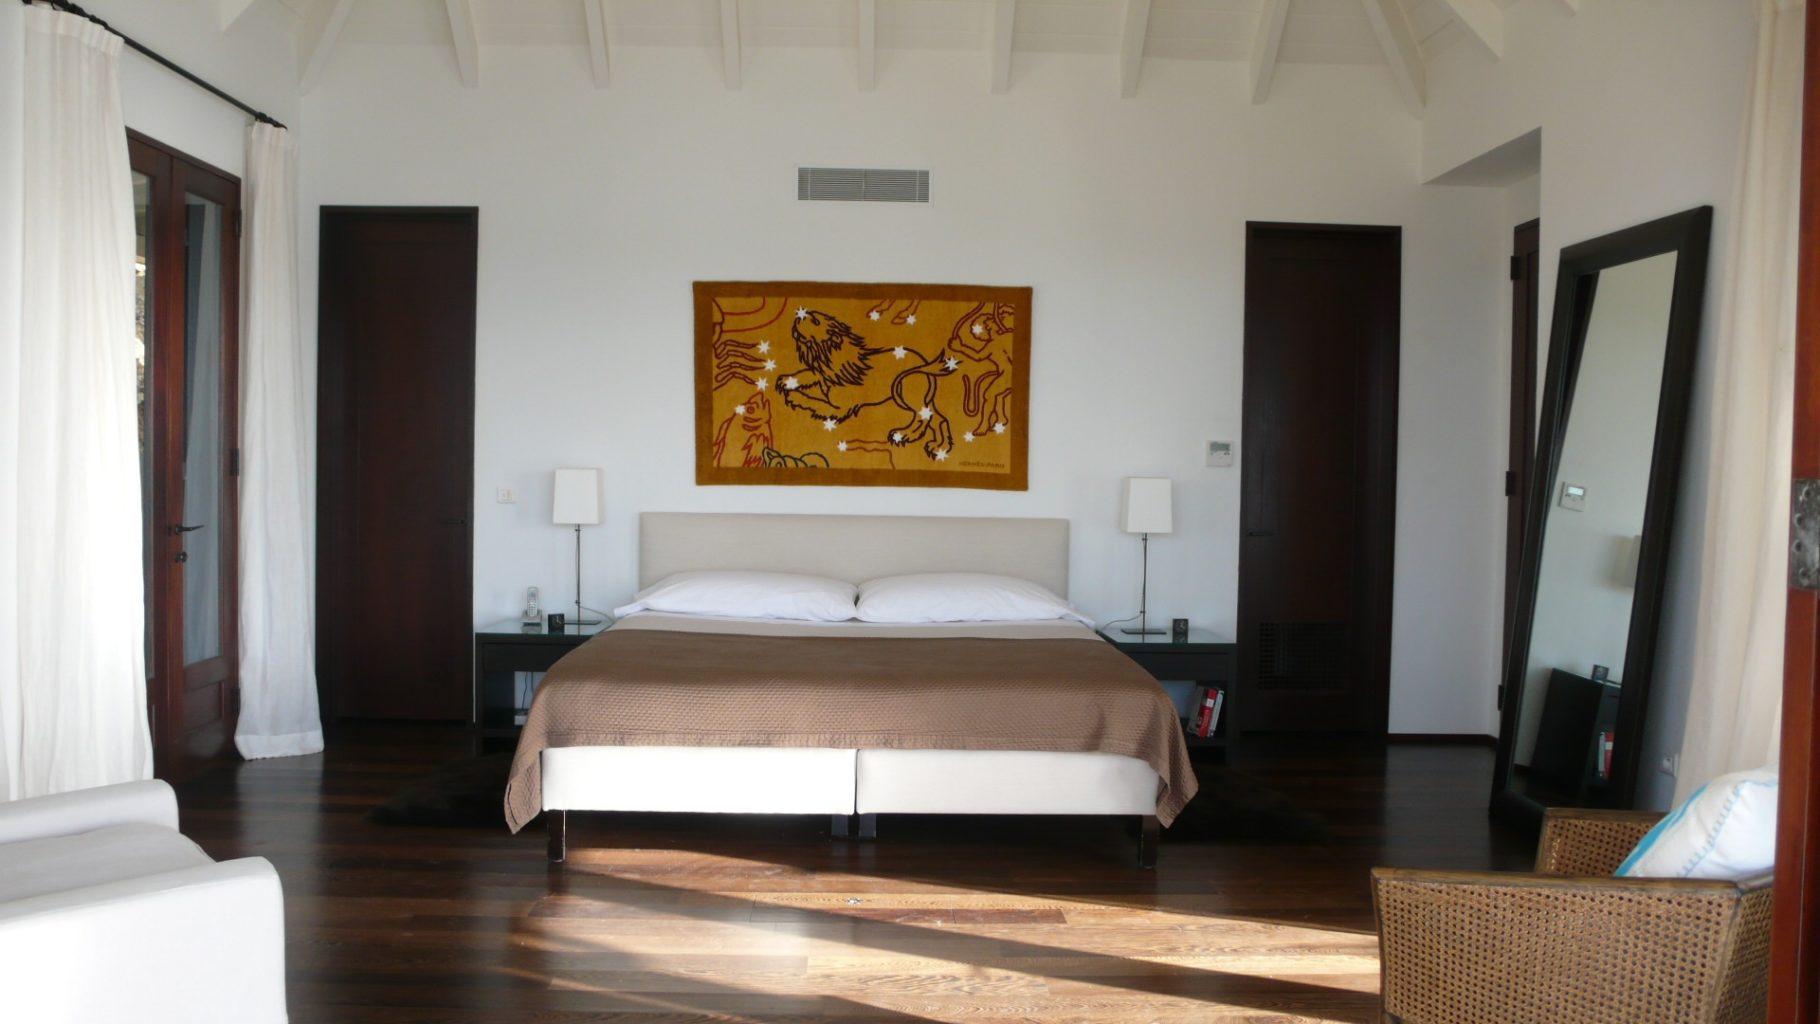 Villa Ella - Modern Villa Rental St Barth Located Few Minutes Away from Beaches, Restaurants and Shops - Bedroom